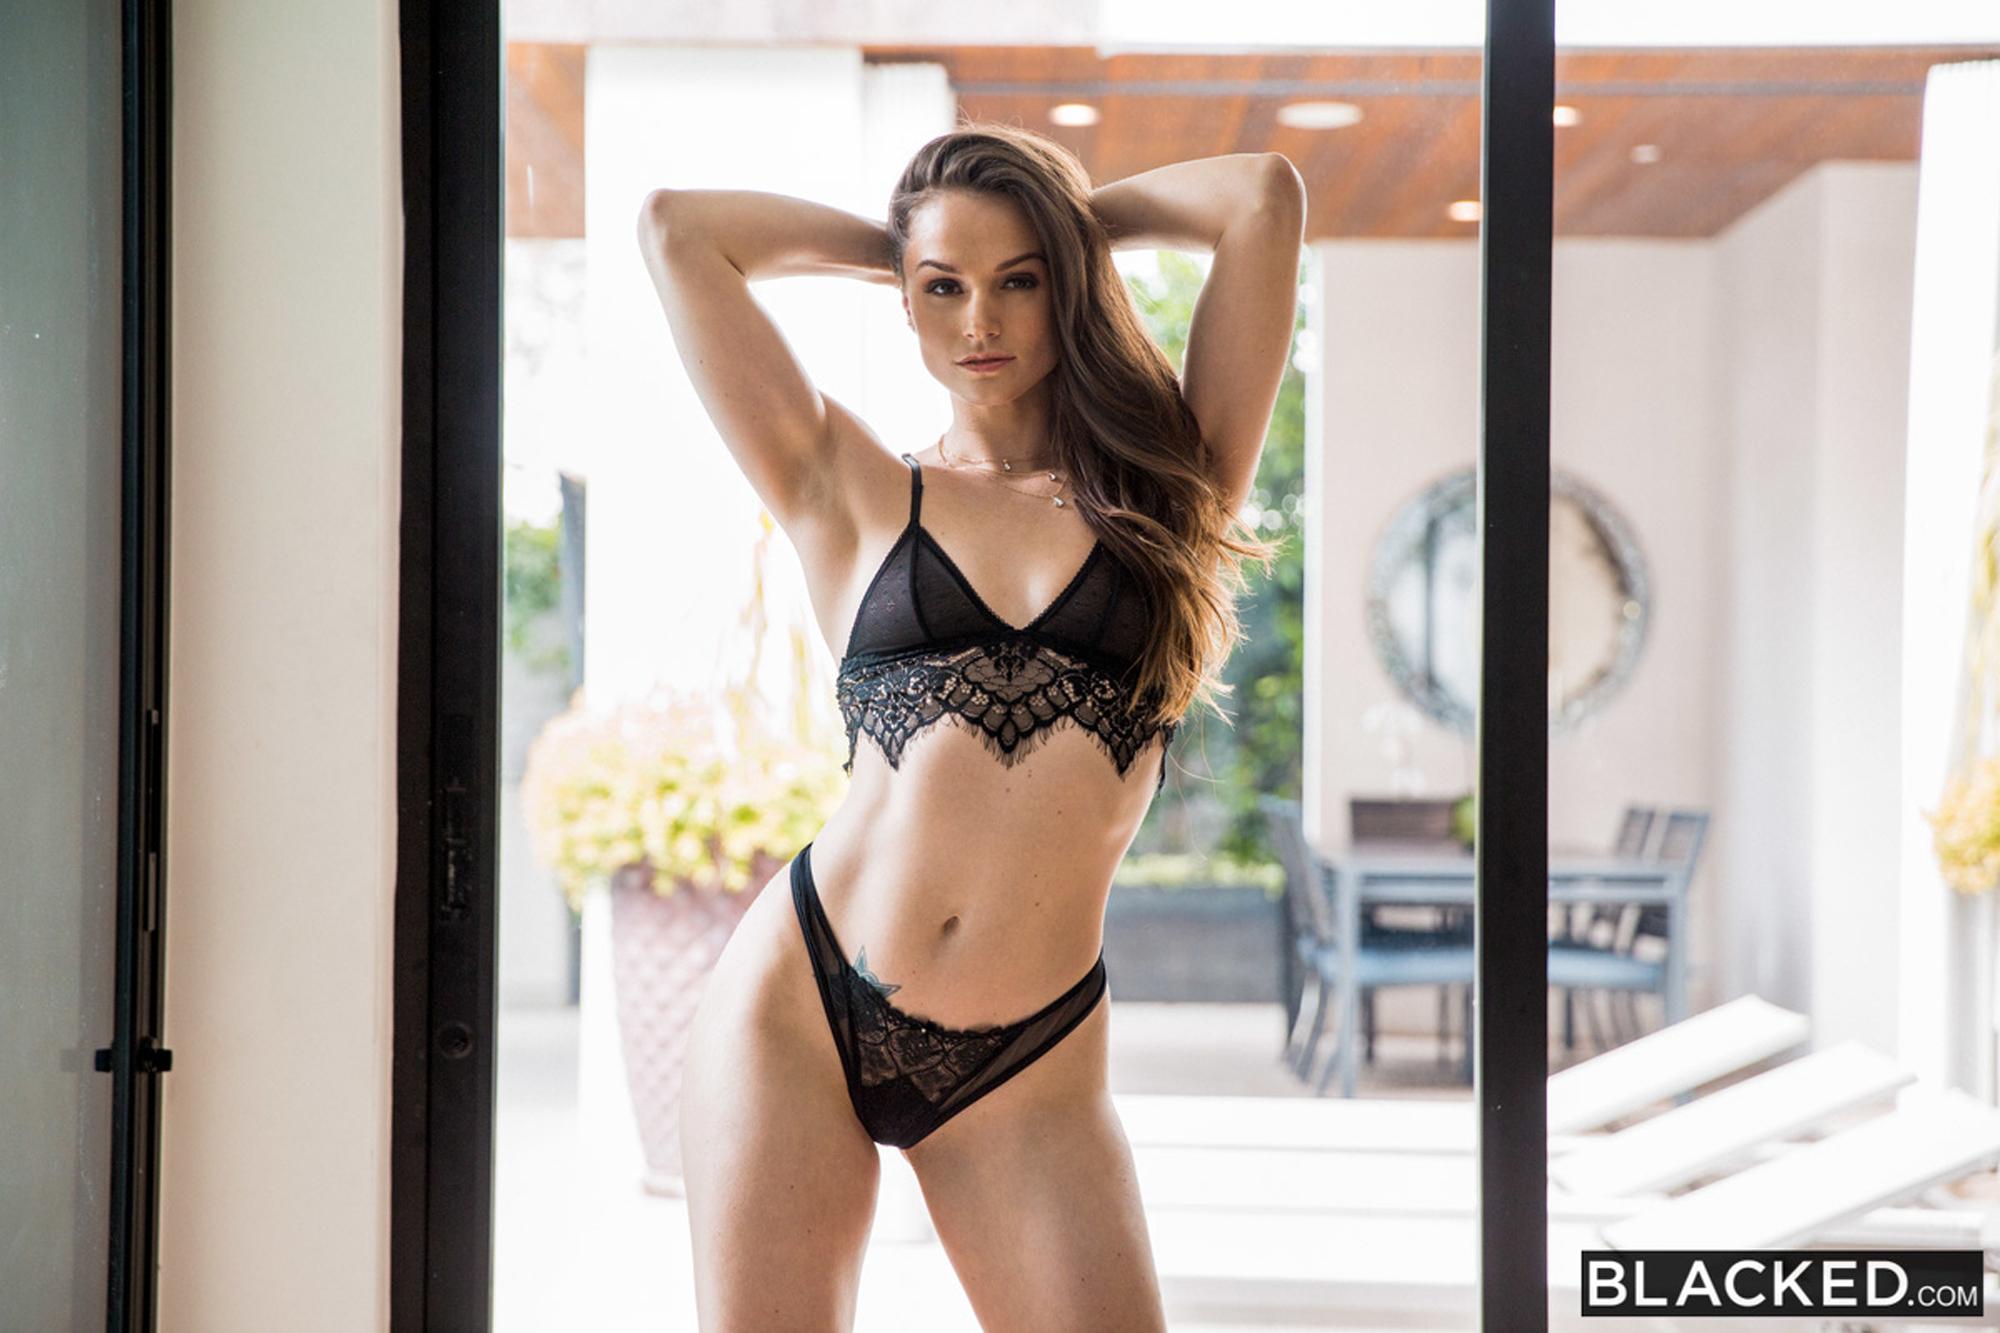 Adult Model Bikini Blacked Bra Cleavage Hot Legs Lingerie Pornstar Sexy Tori Black Underwear